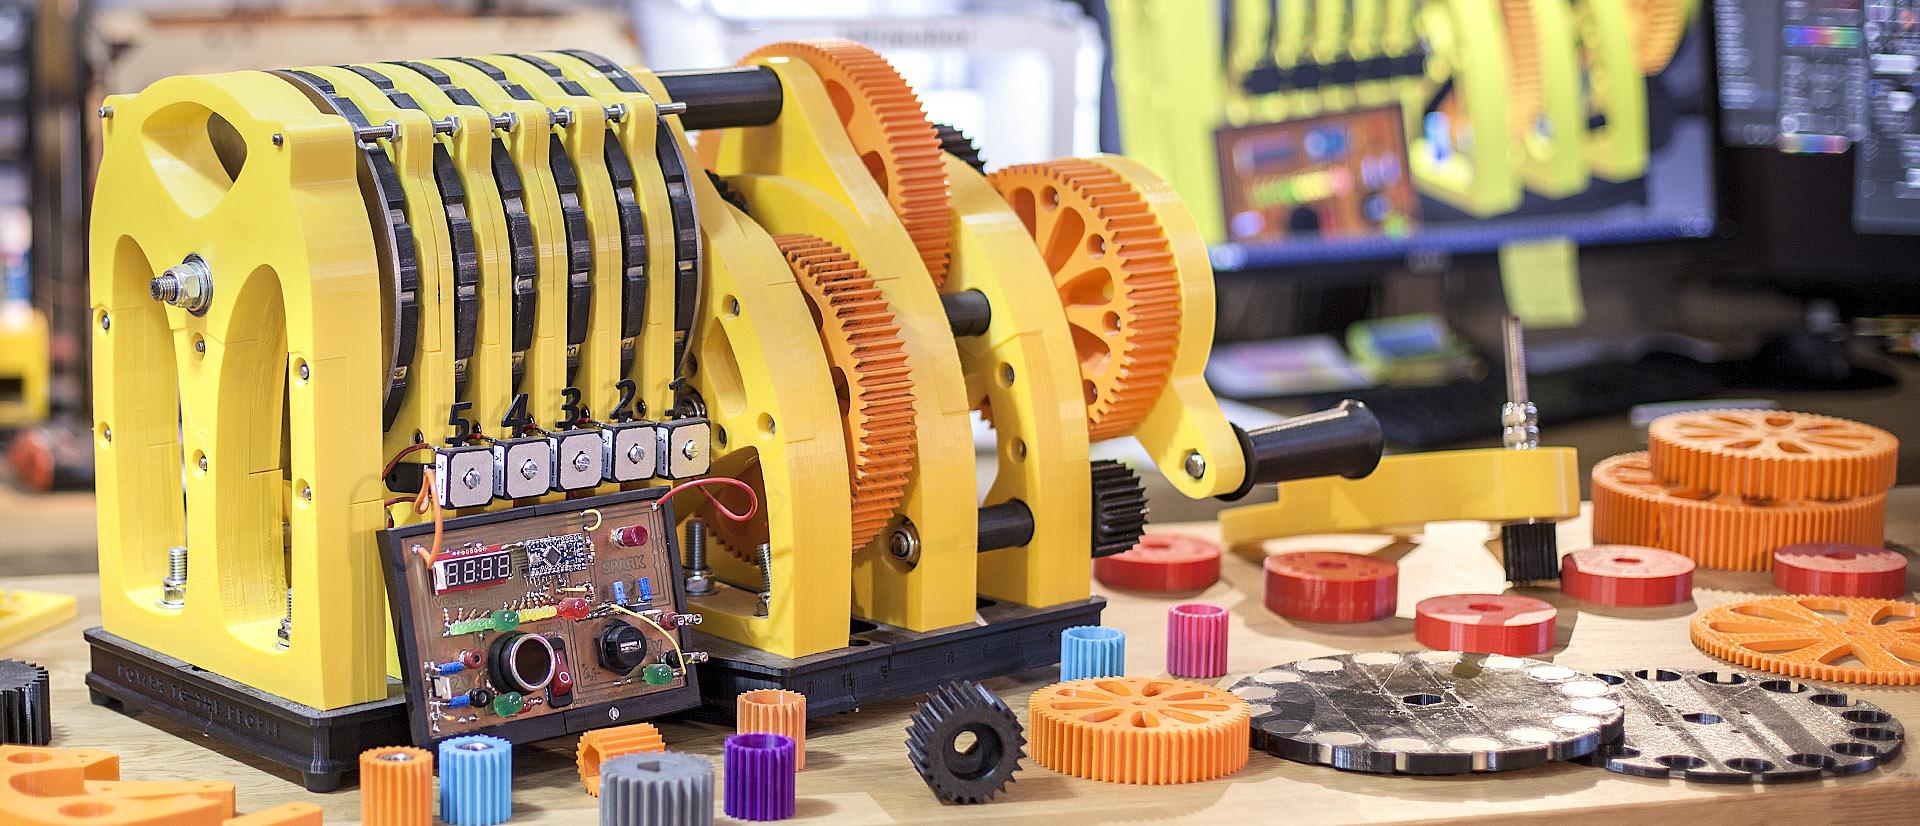 Justpressprint 3d printed Power Generator The Beest